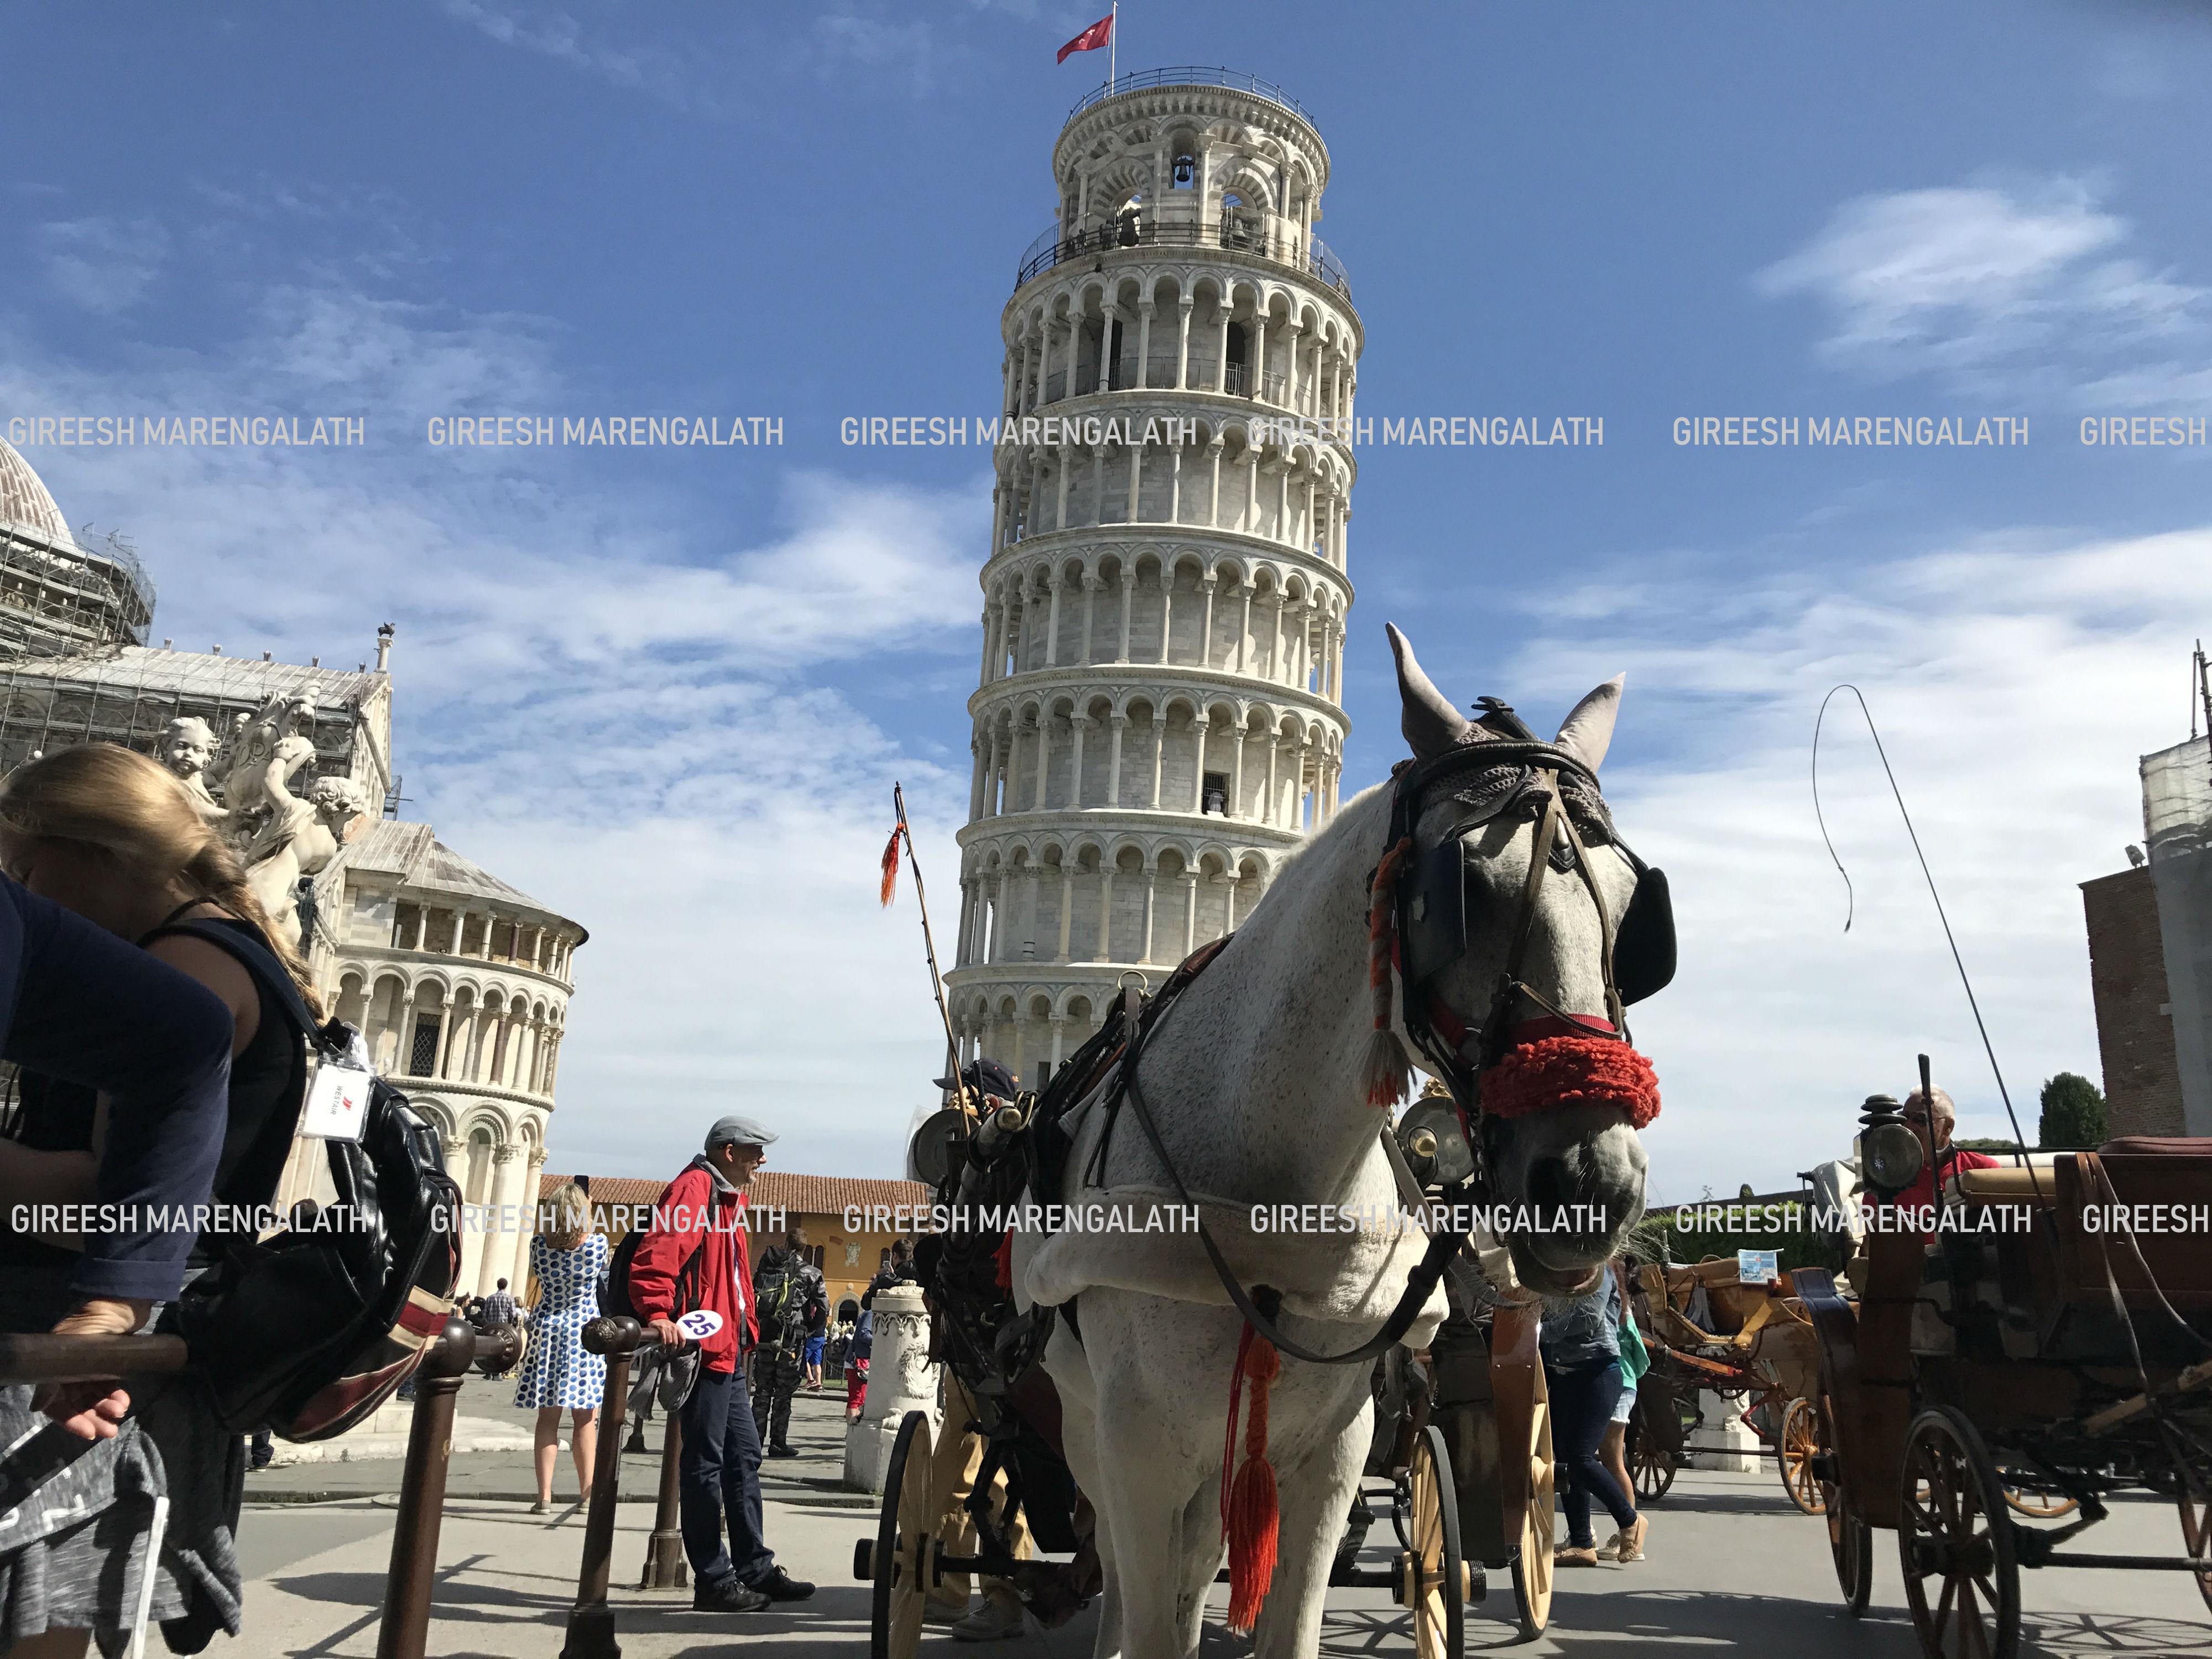 Mobile phone photo of Pisa Leaning Tower, Italy. Photo credit: Gireesh Marangelath